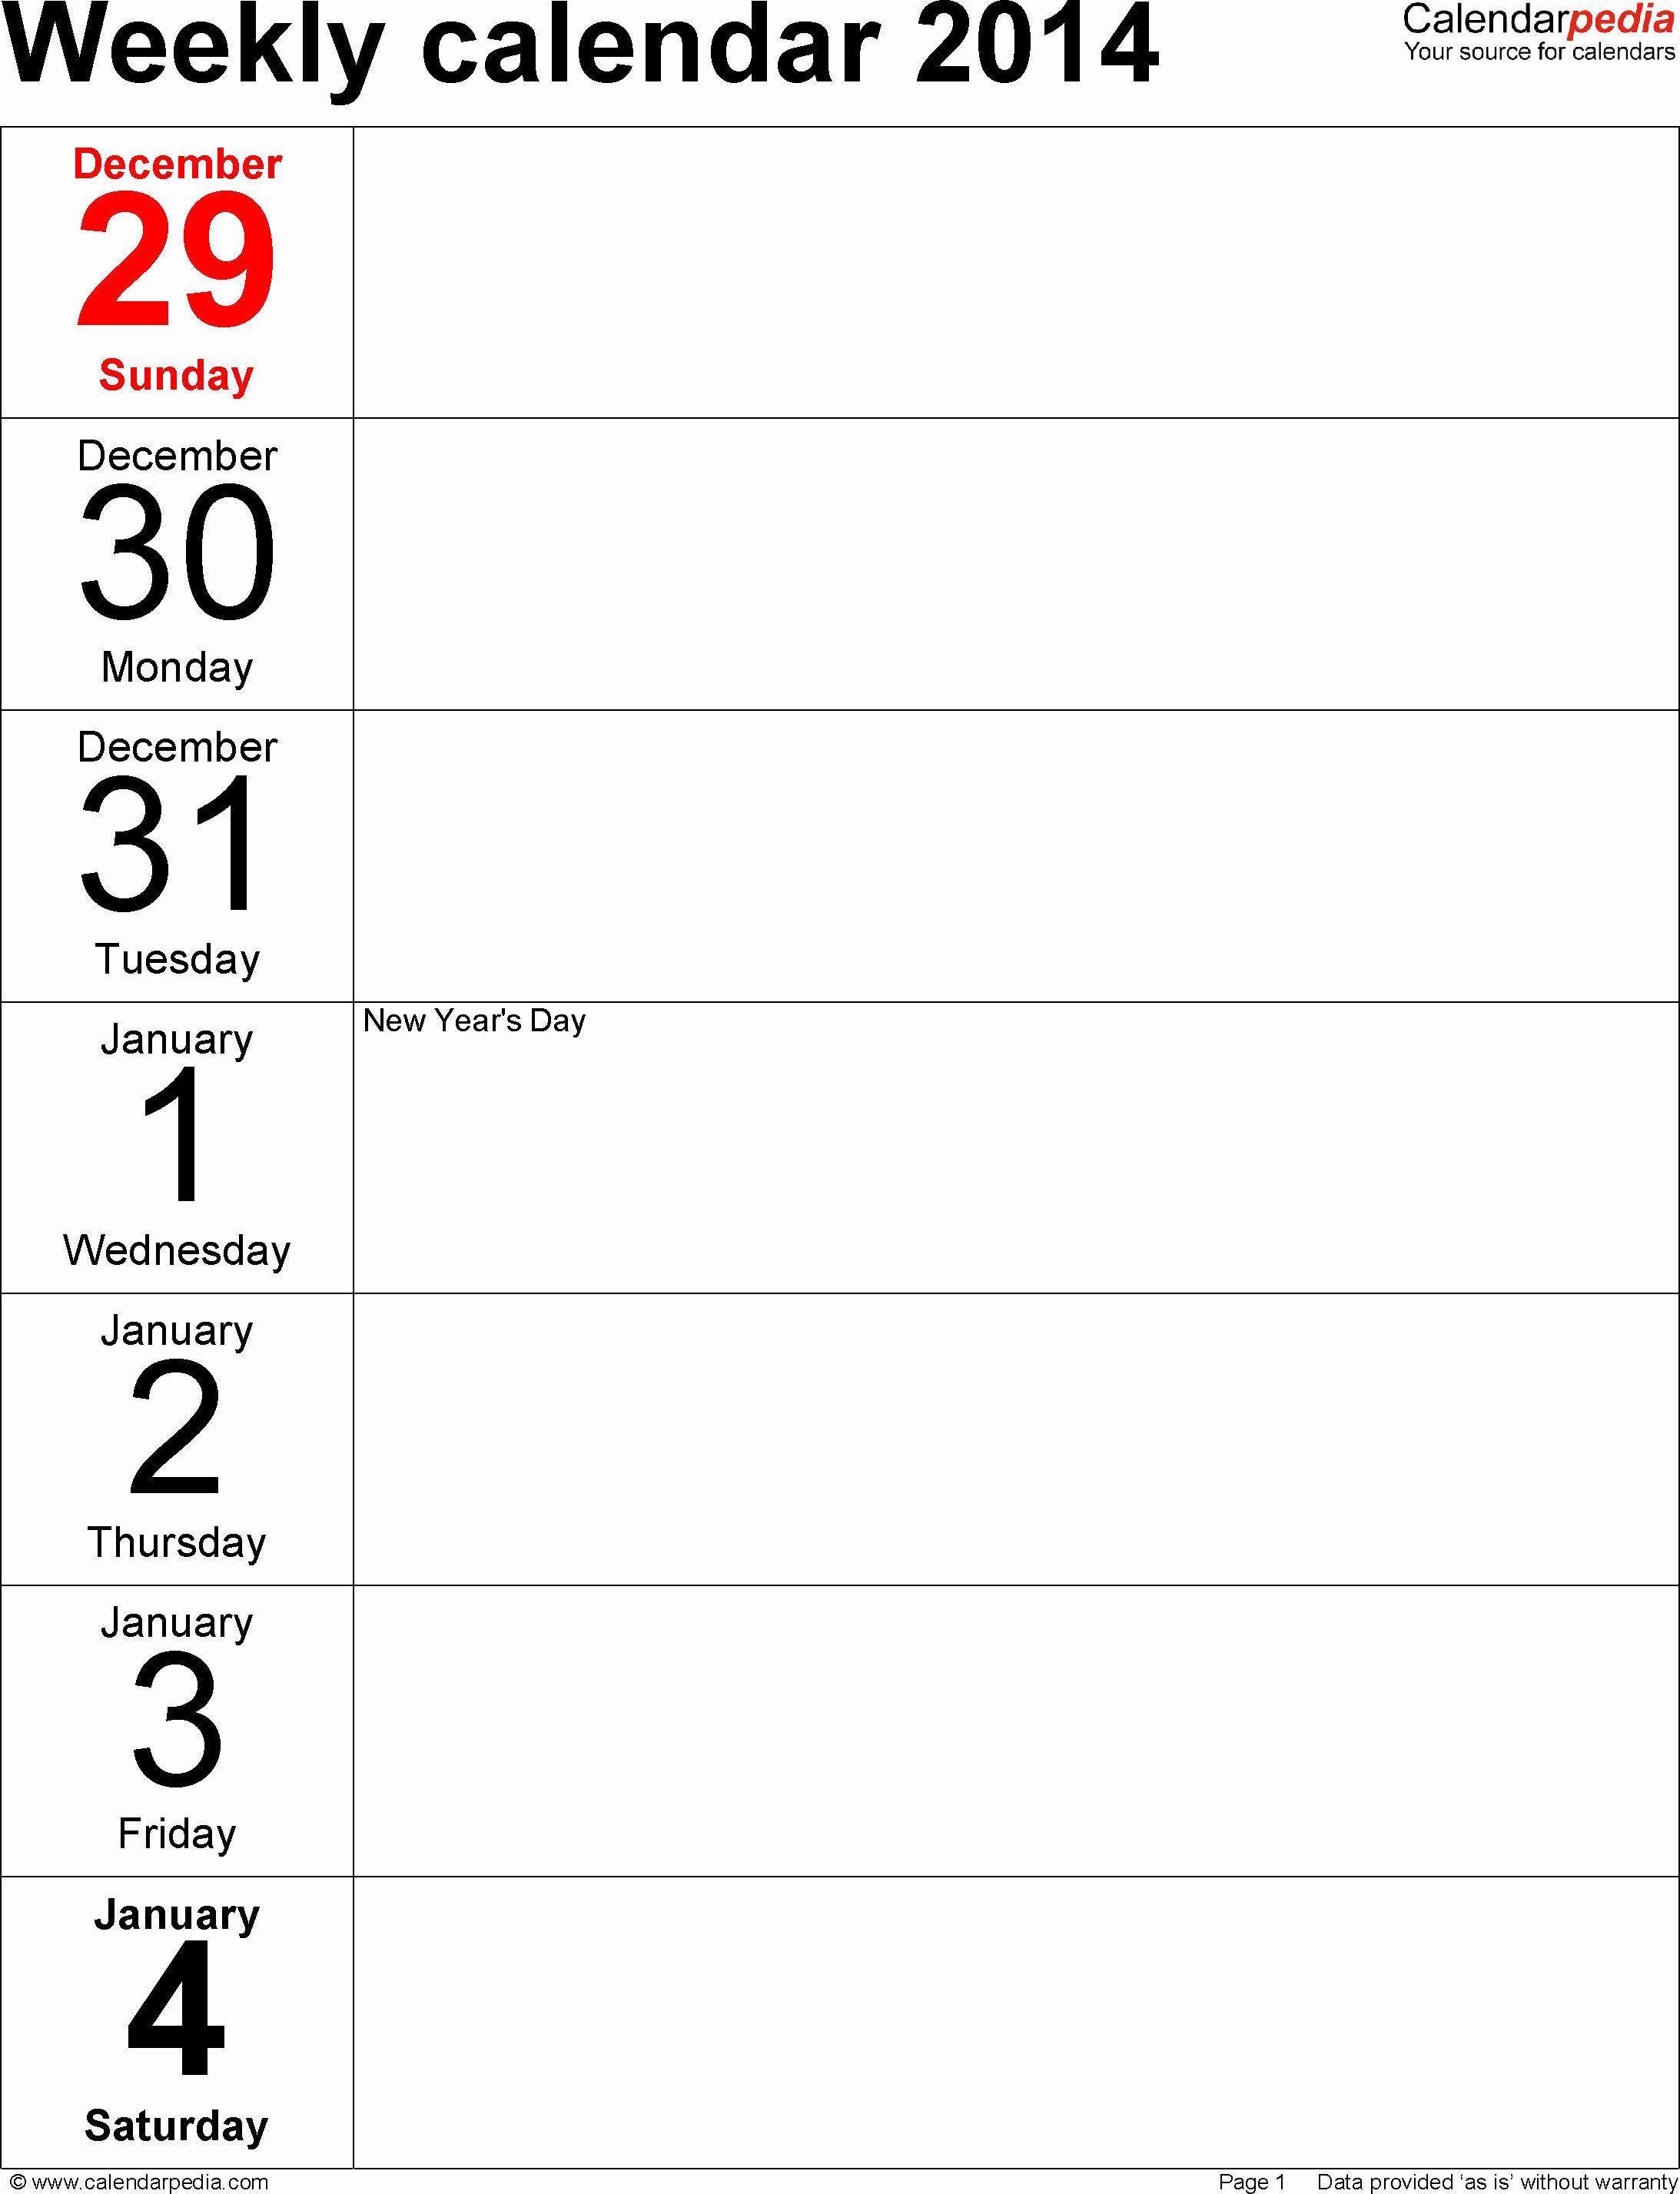 Microsoft Word Weekly Calendar Template Inspirational Weekly Calendar 2014 for Word 4 Free Printable Templates